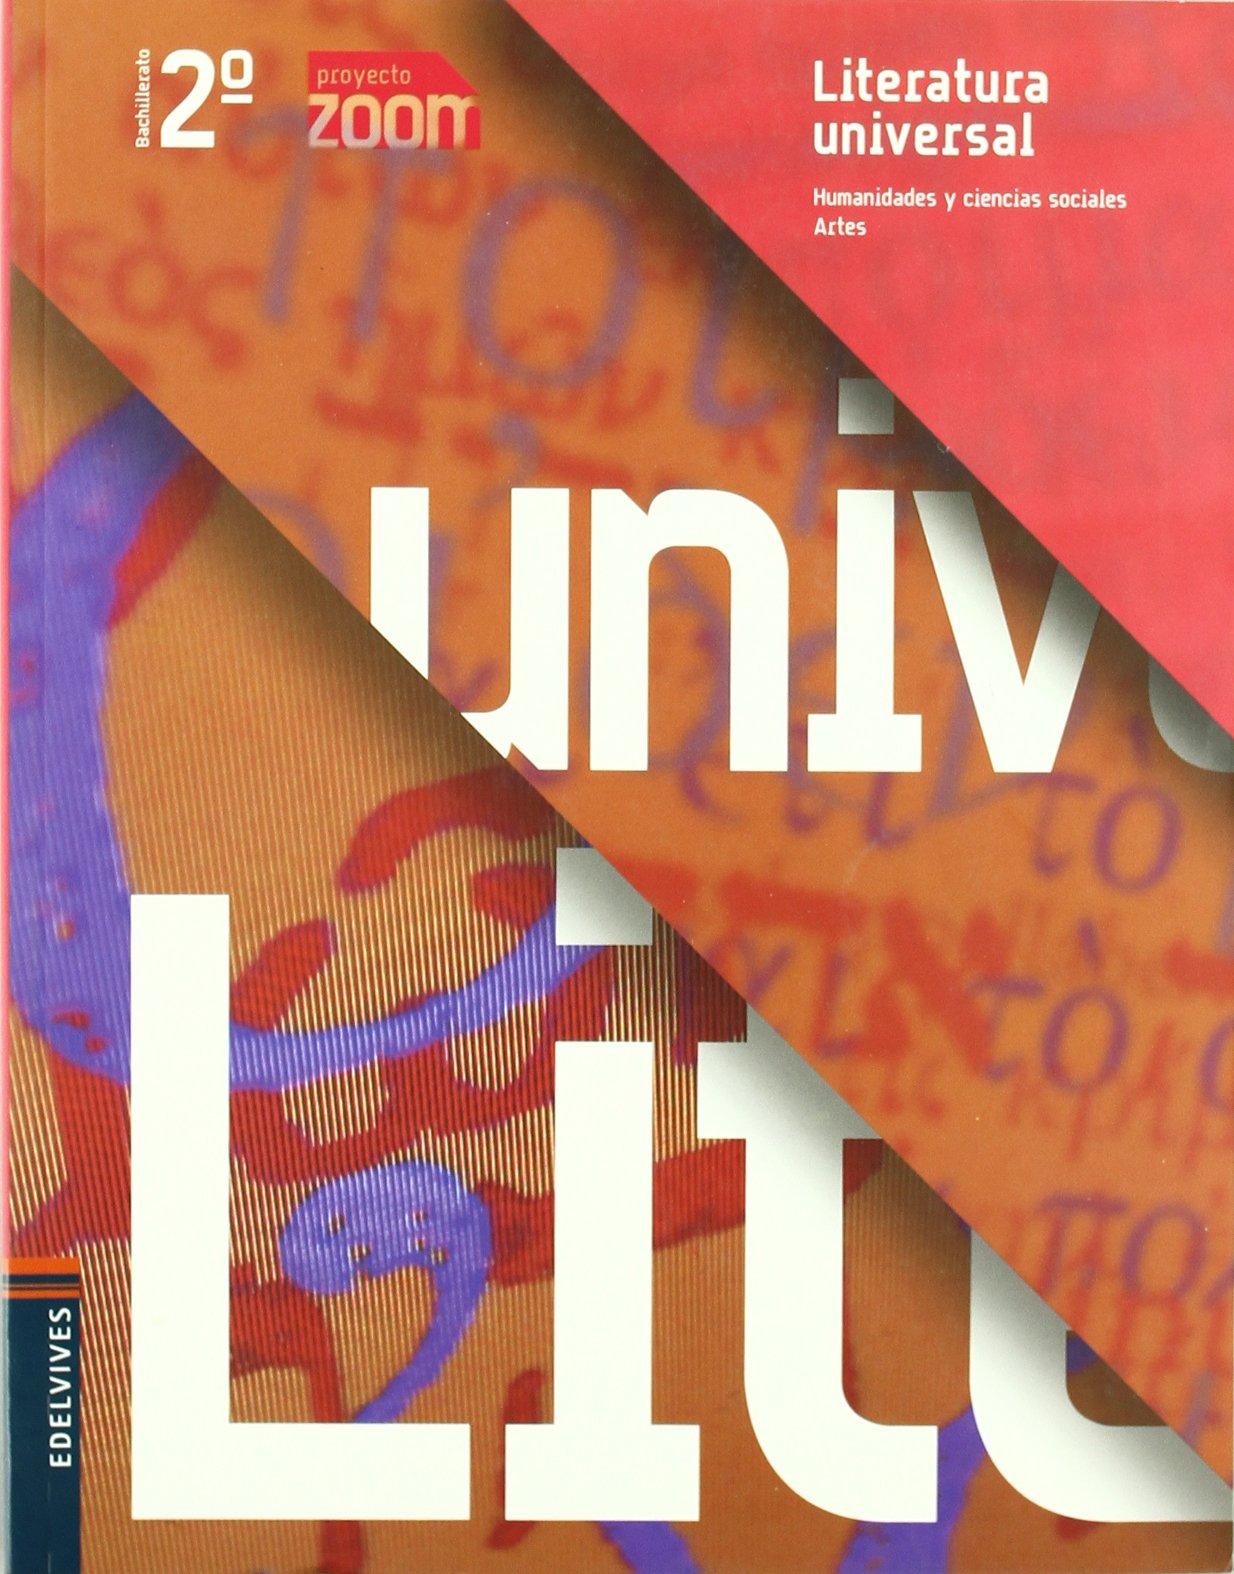 Literatura Universal 2º Bachillerato Zoom - 9788426369758: Amazon.es: González-Serna Sánchez, José Mª, Llona Colino, Mª Casilda, Domínguez Rubiales, Francisco: Libros